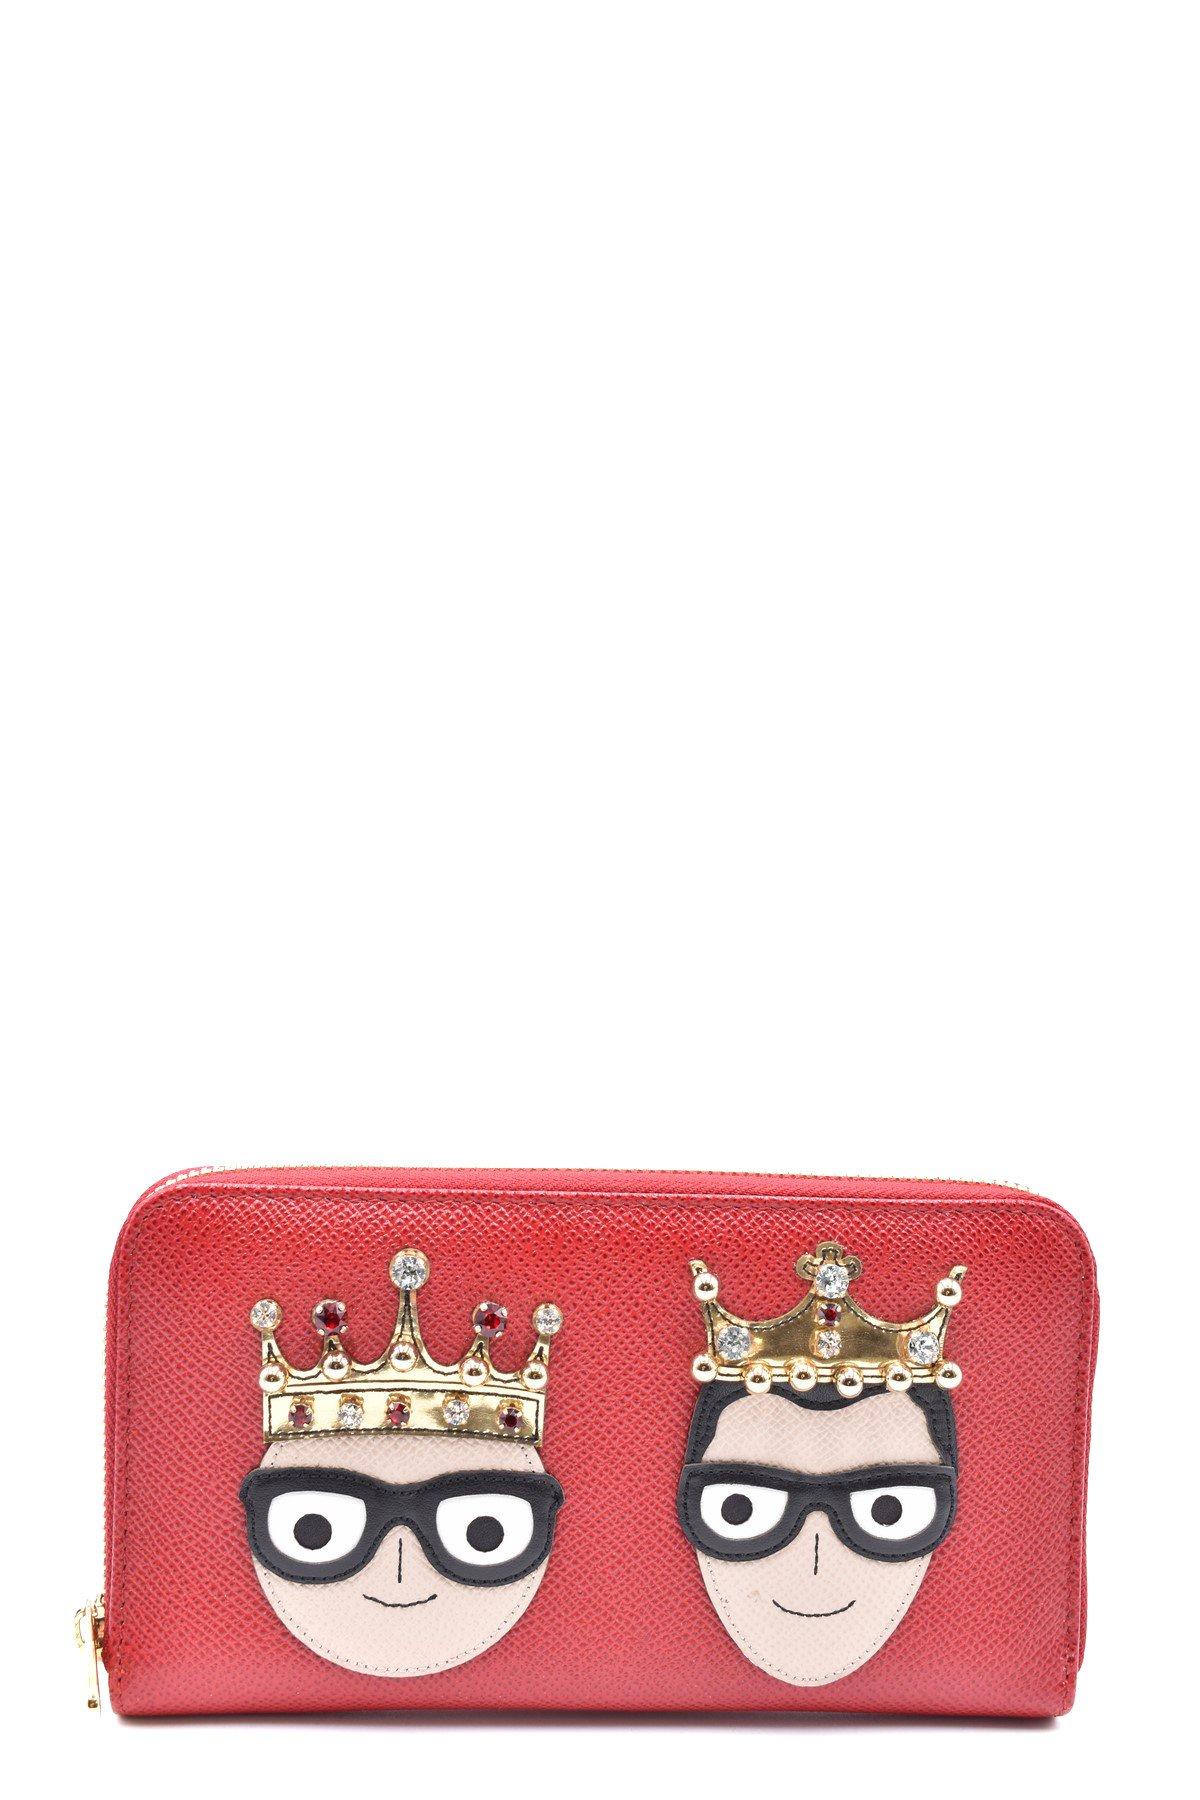 Dolce & Gabbana Women's Wallet Black 248445 - red UNICA